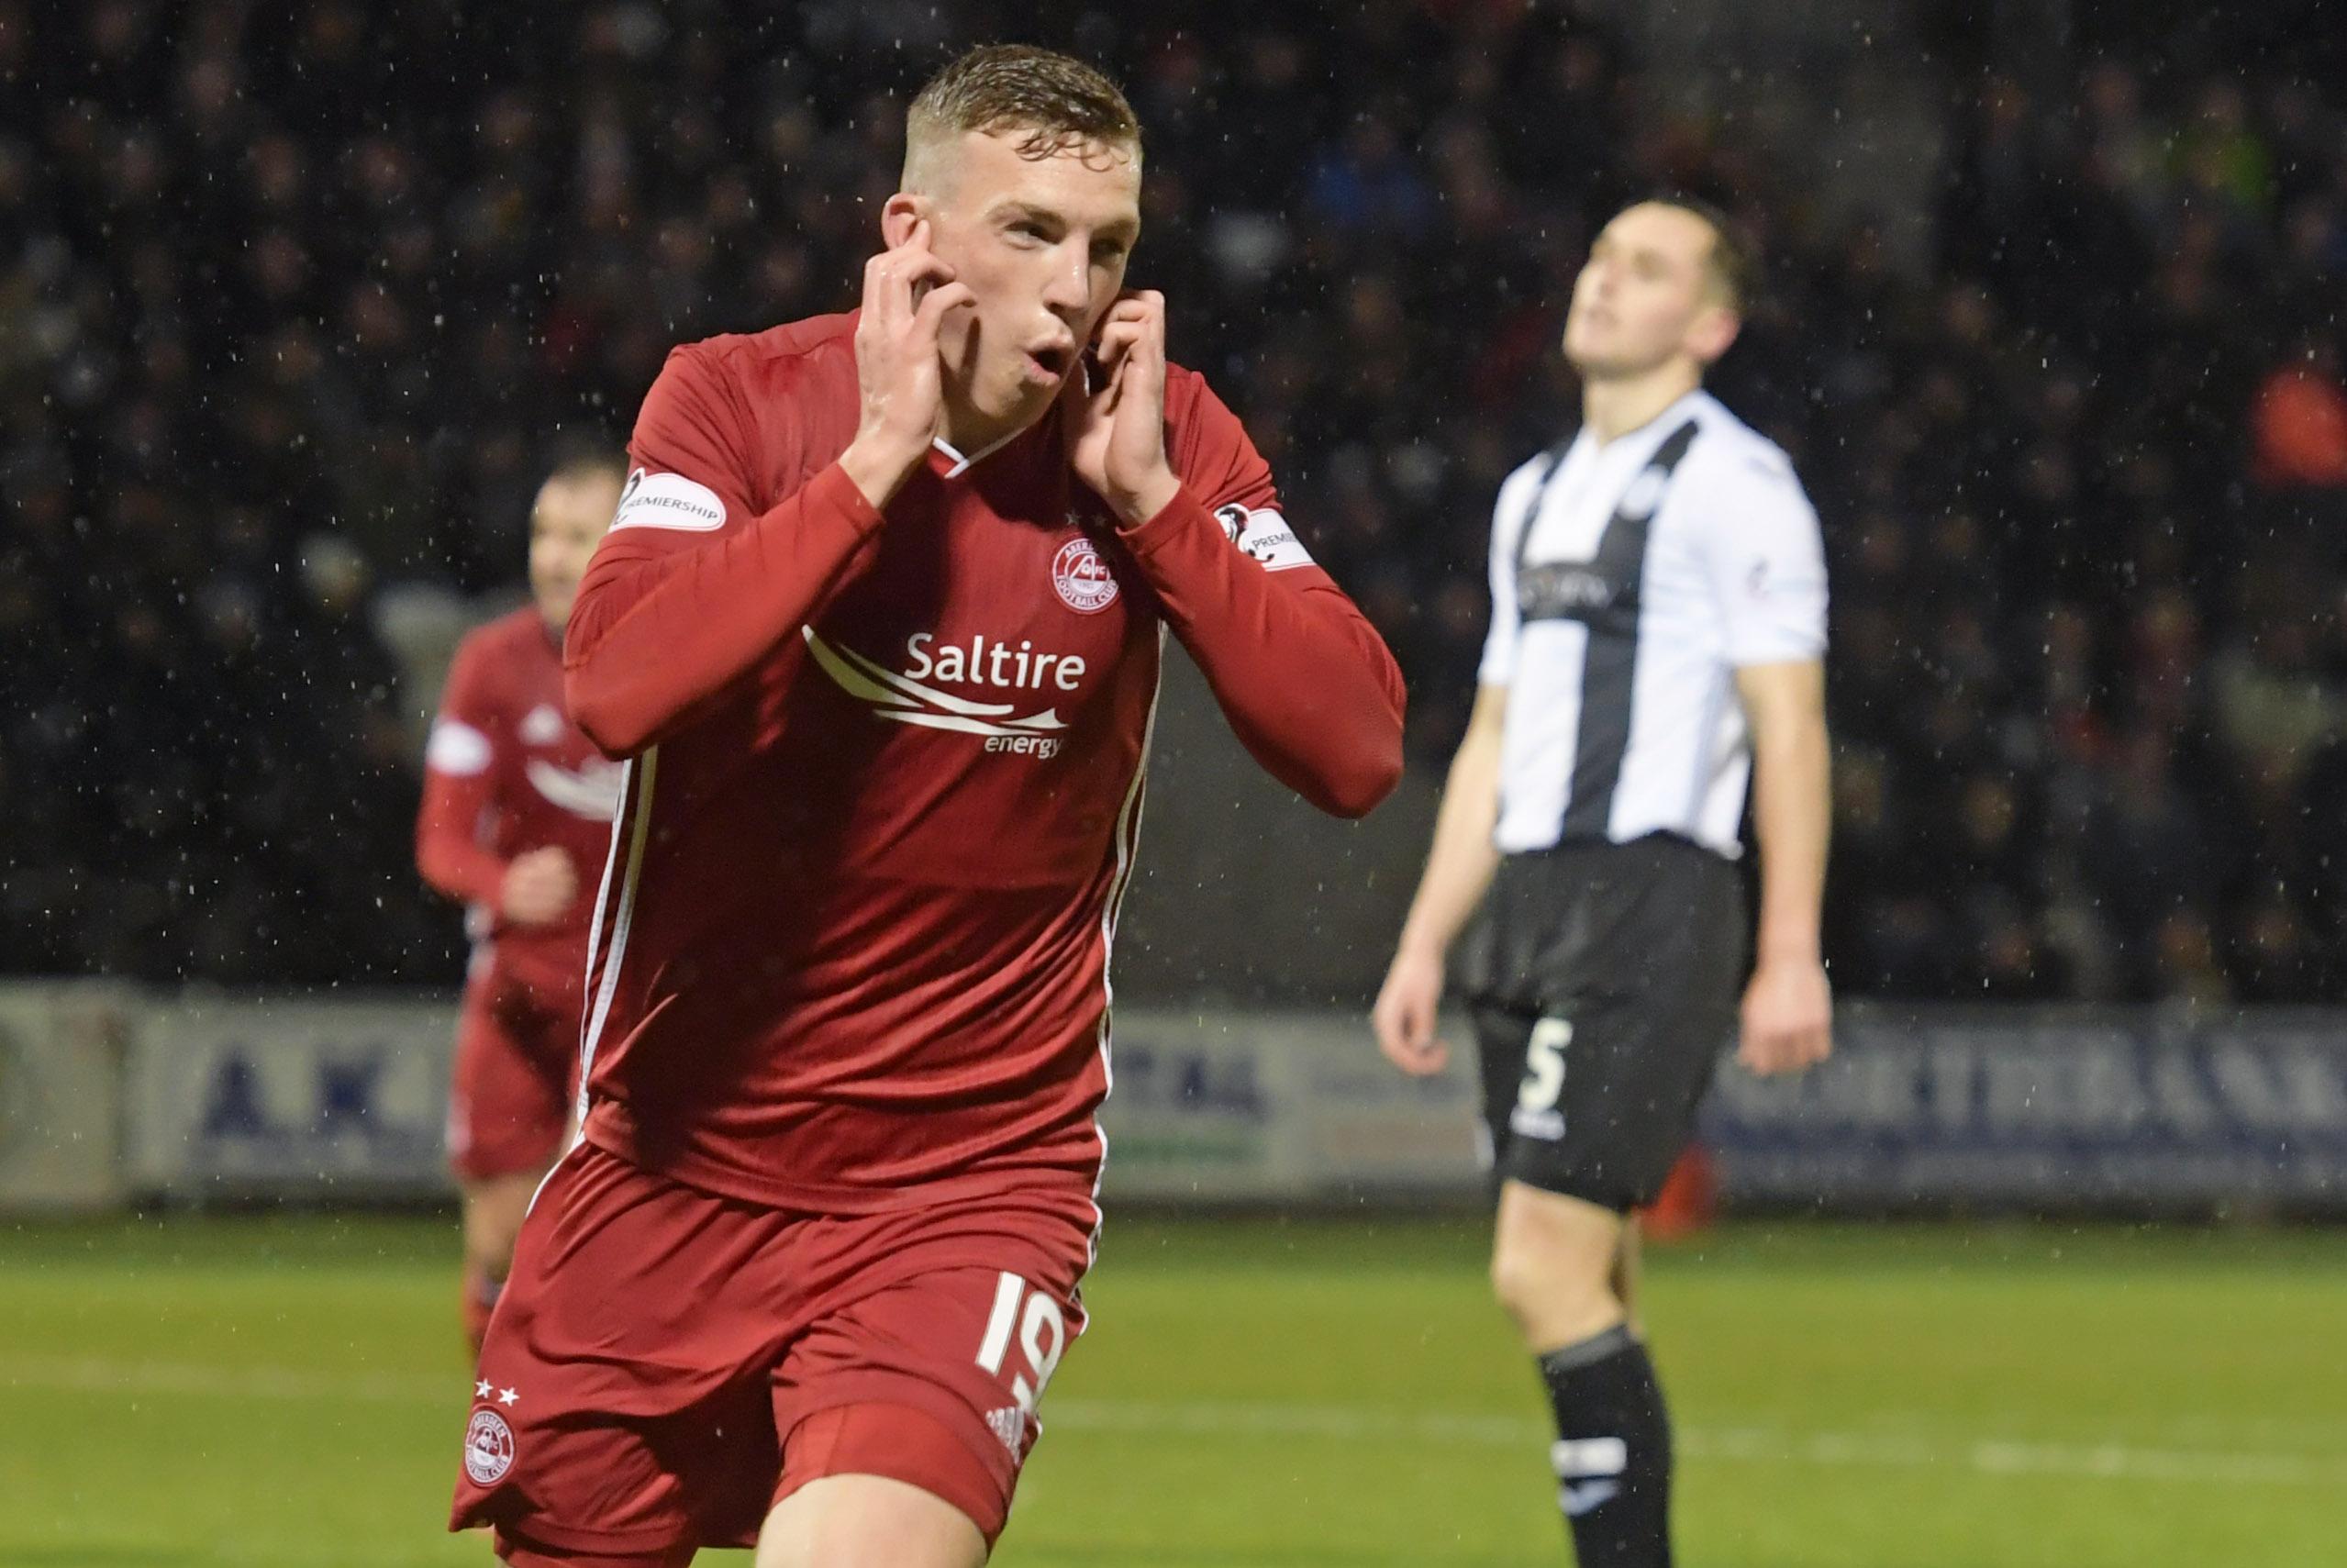 Aberdeen are still in last season's Scottish Cup.